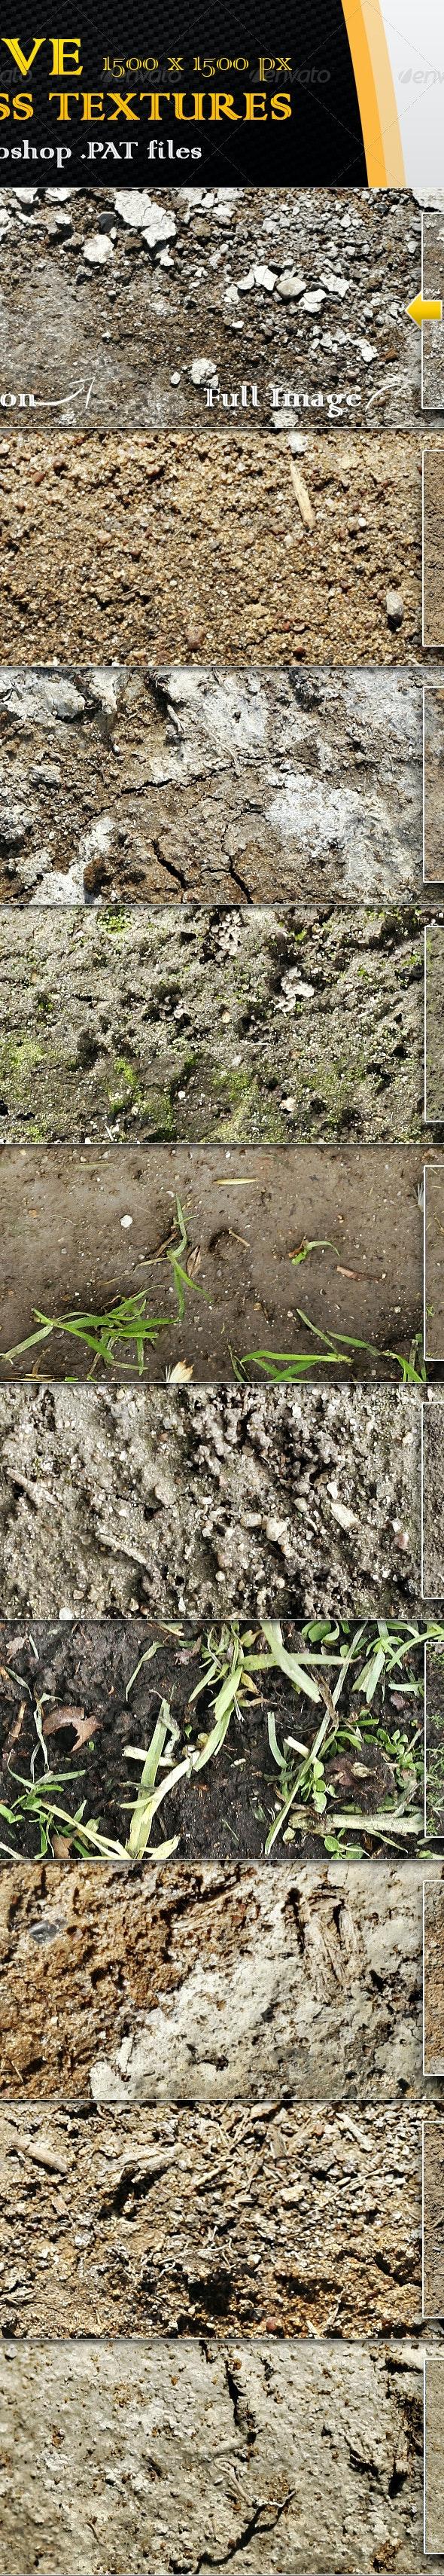 10 Seamless Dirt and Soil Textures - Nature Textures / Fills / Patterns